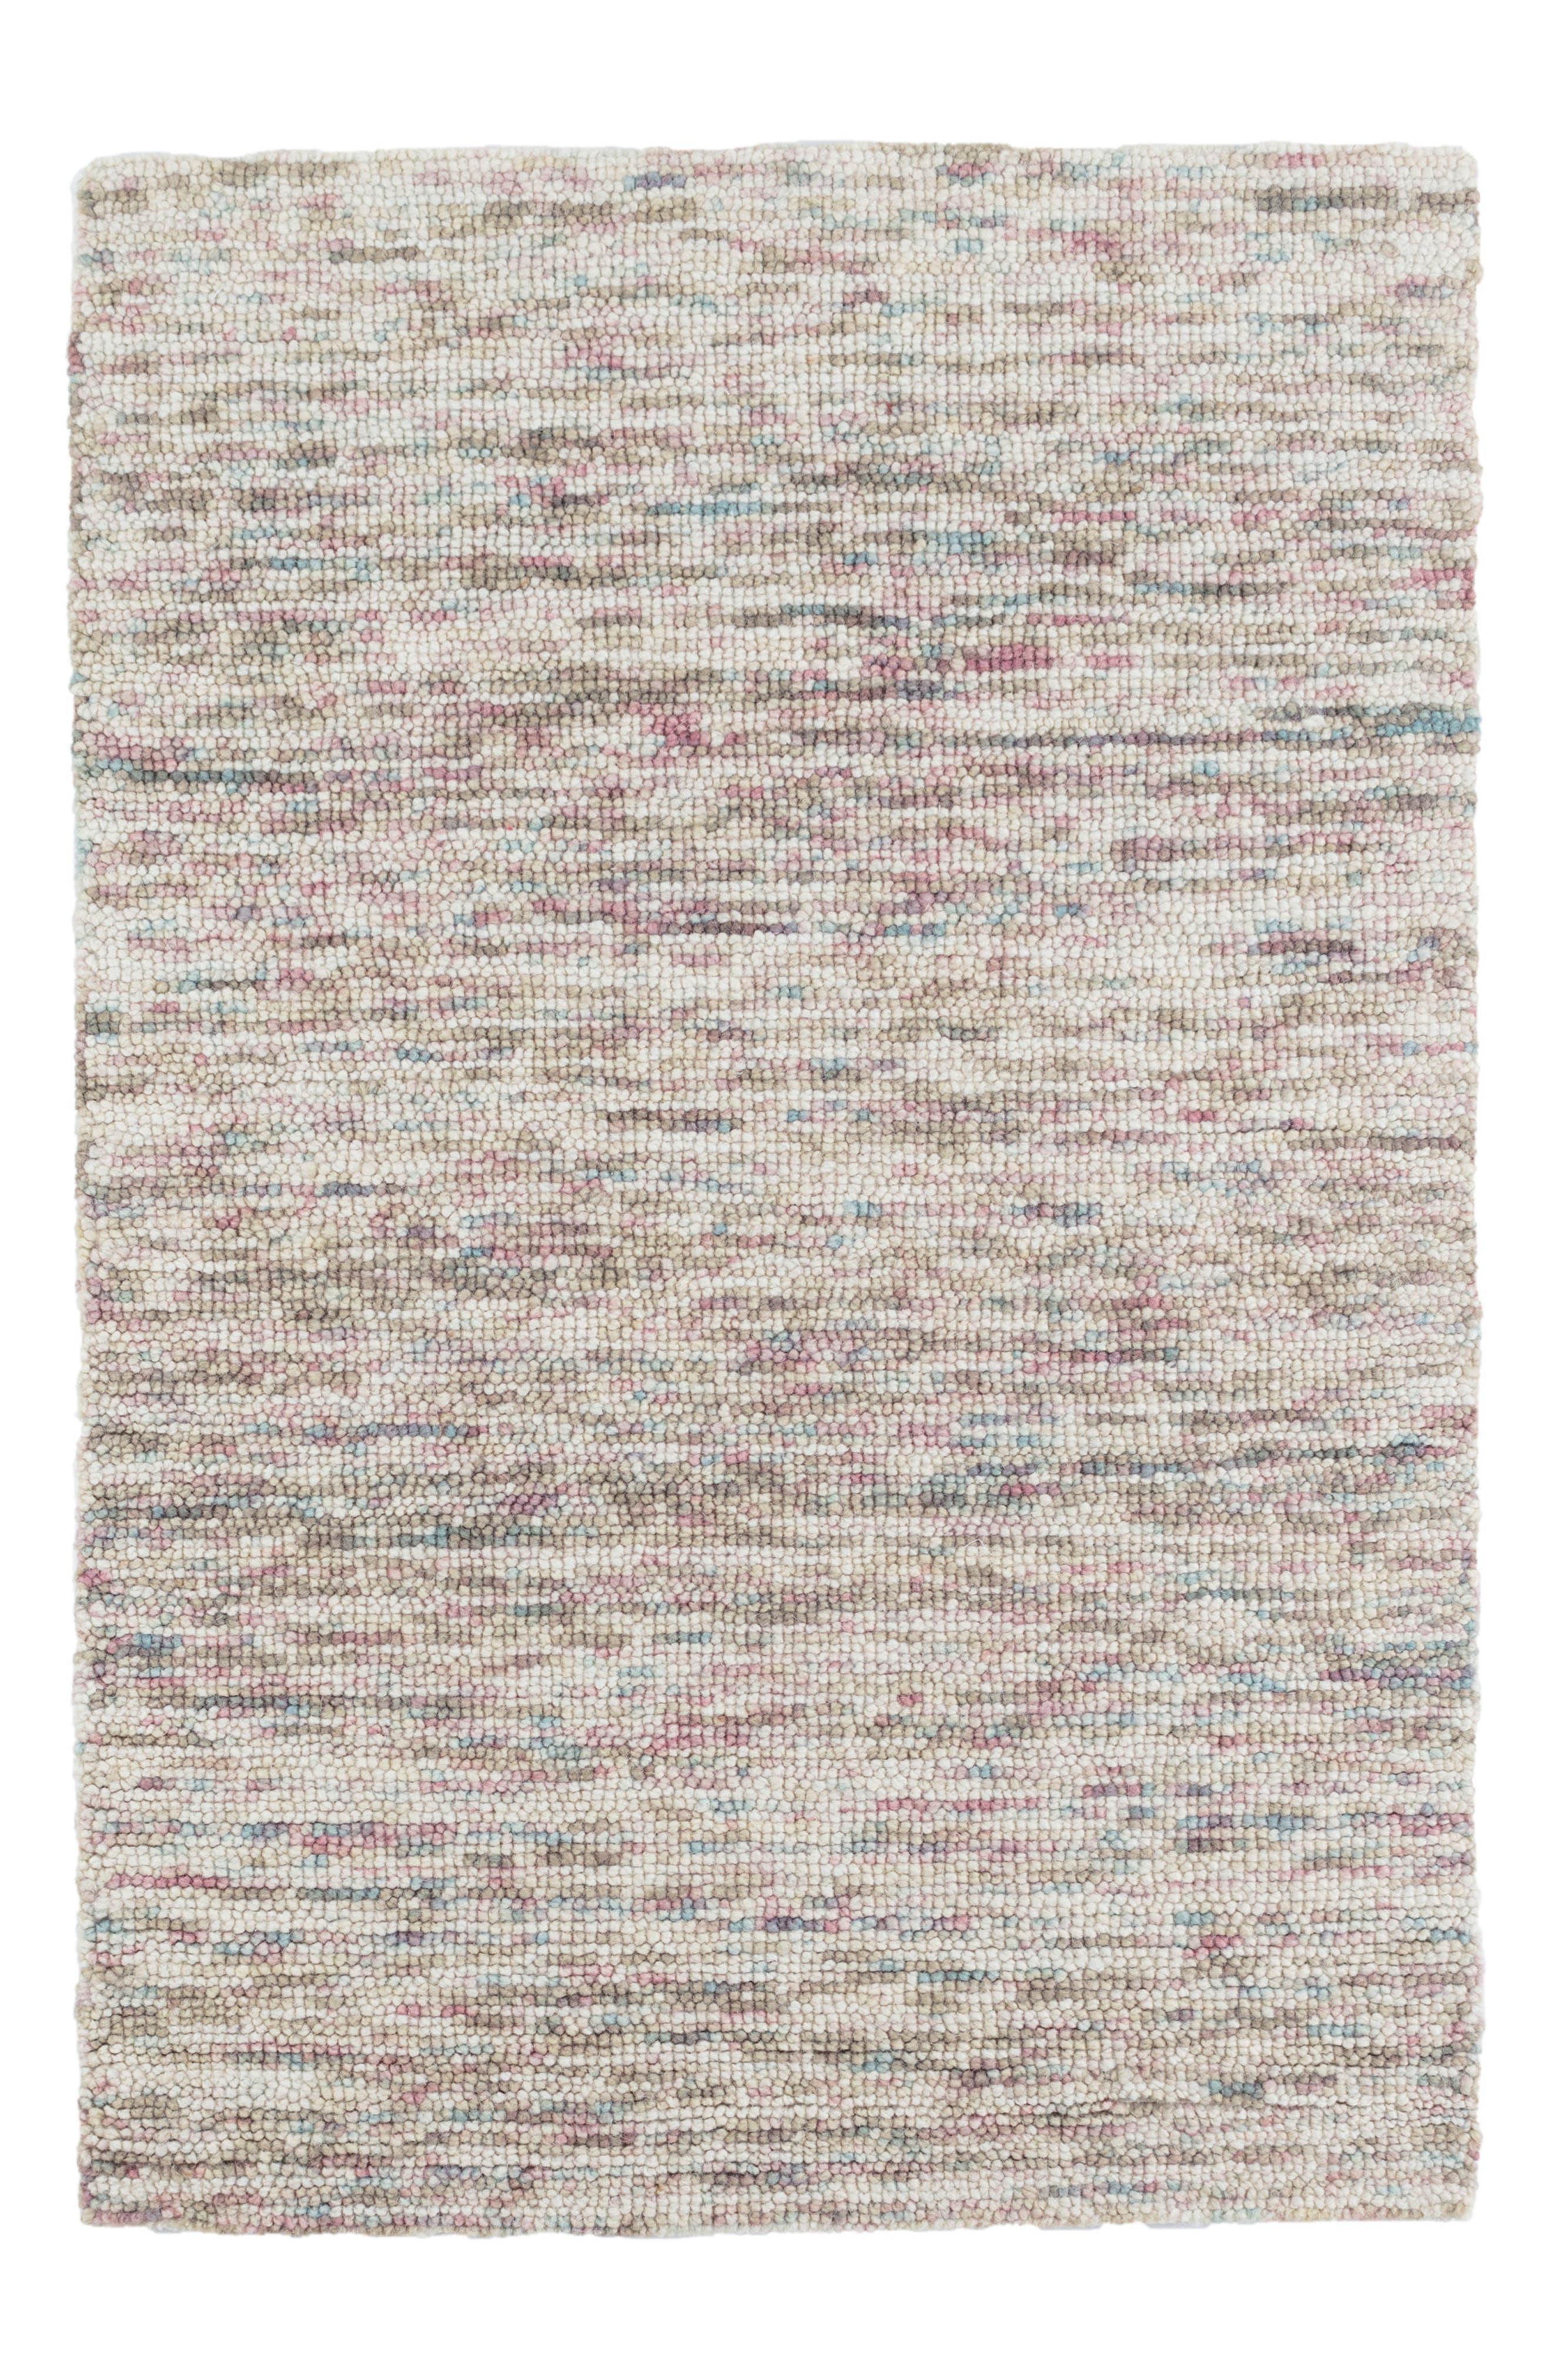 Alternate Image 1 Selected - Dash & Albert Artisanal Hooked Wool Rug